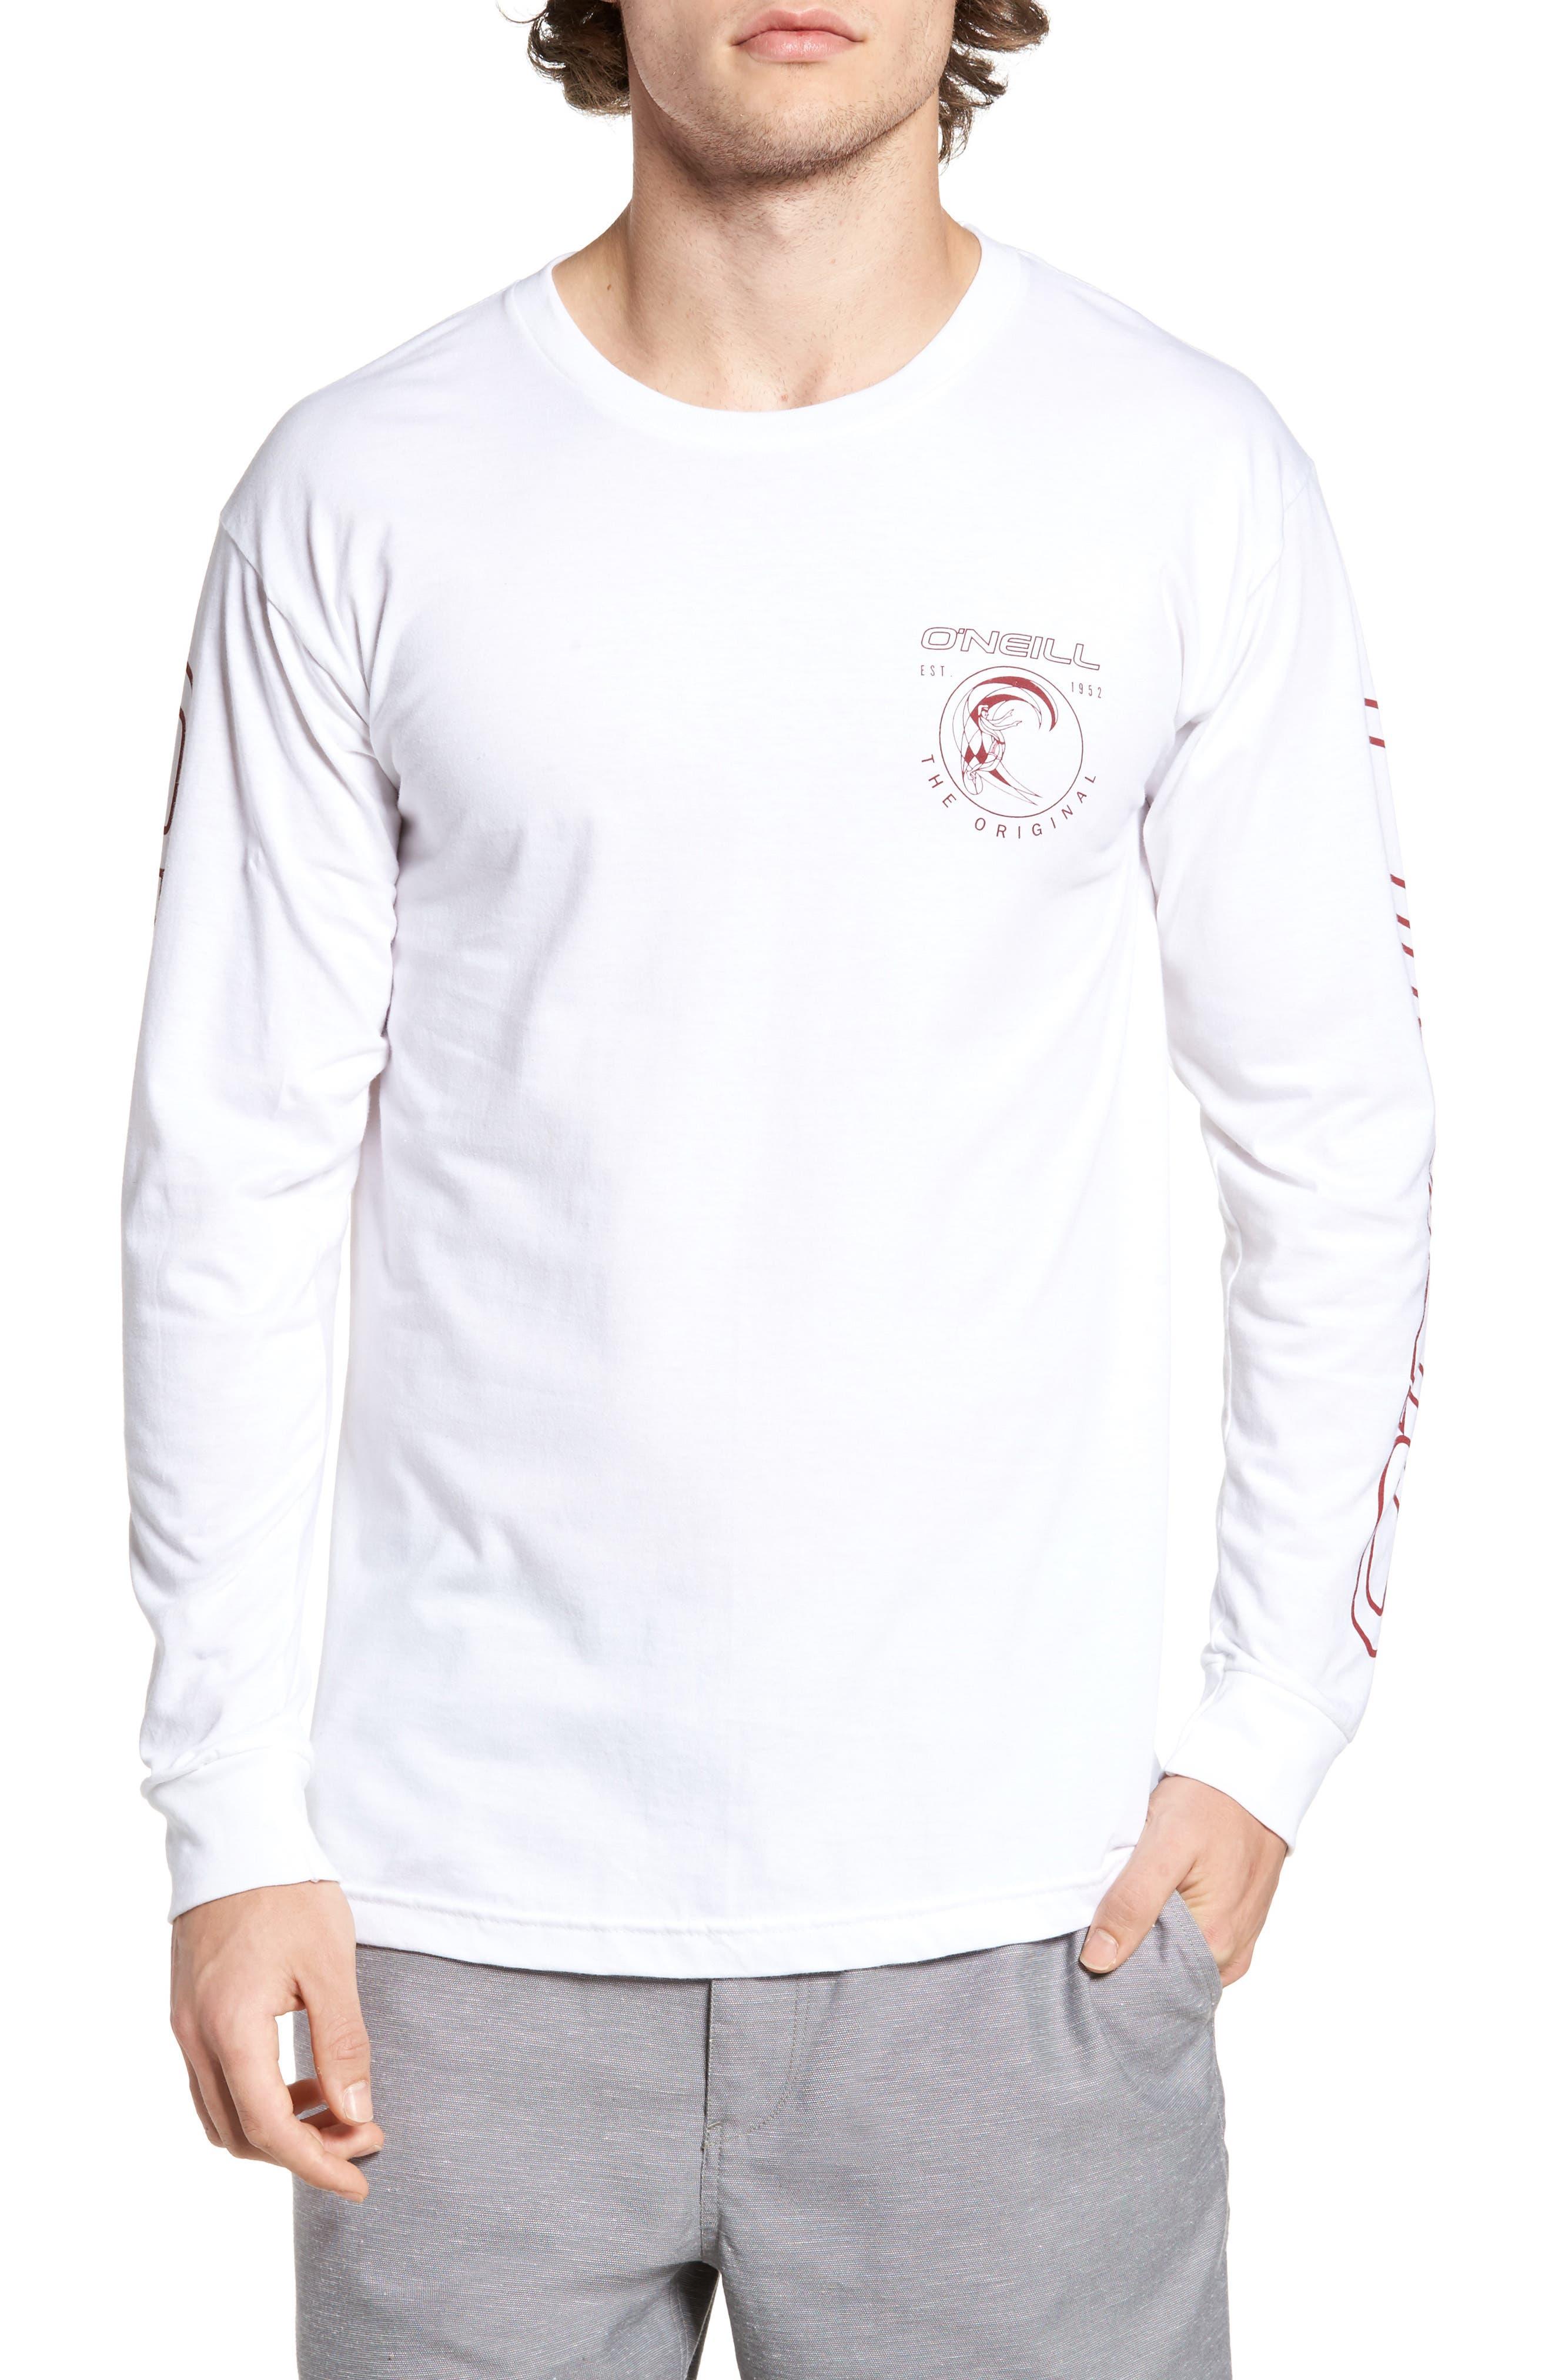 O'Neill Monumental Graphic T-Shirt